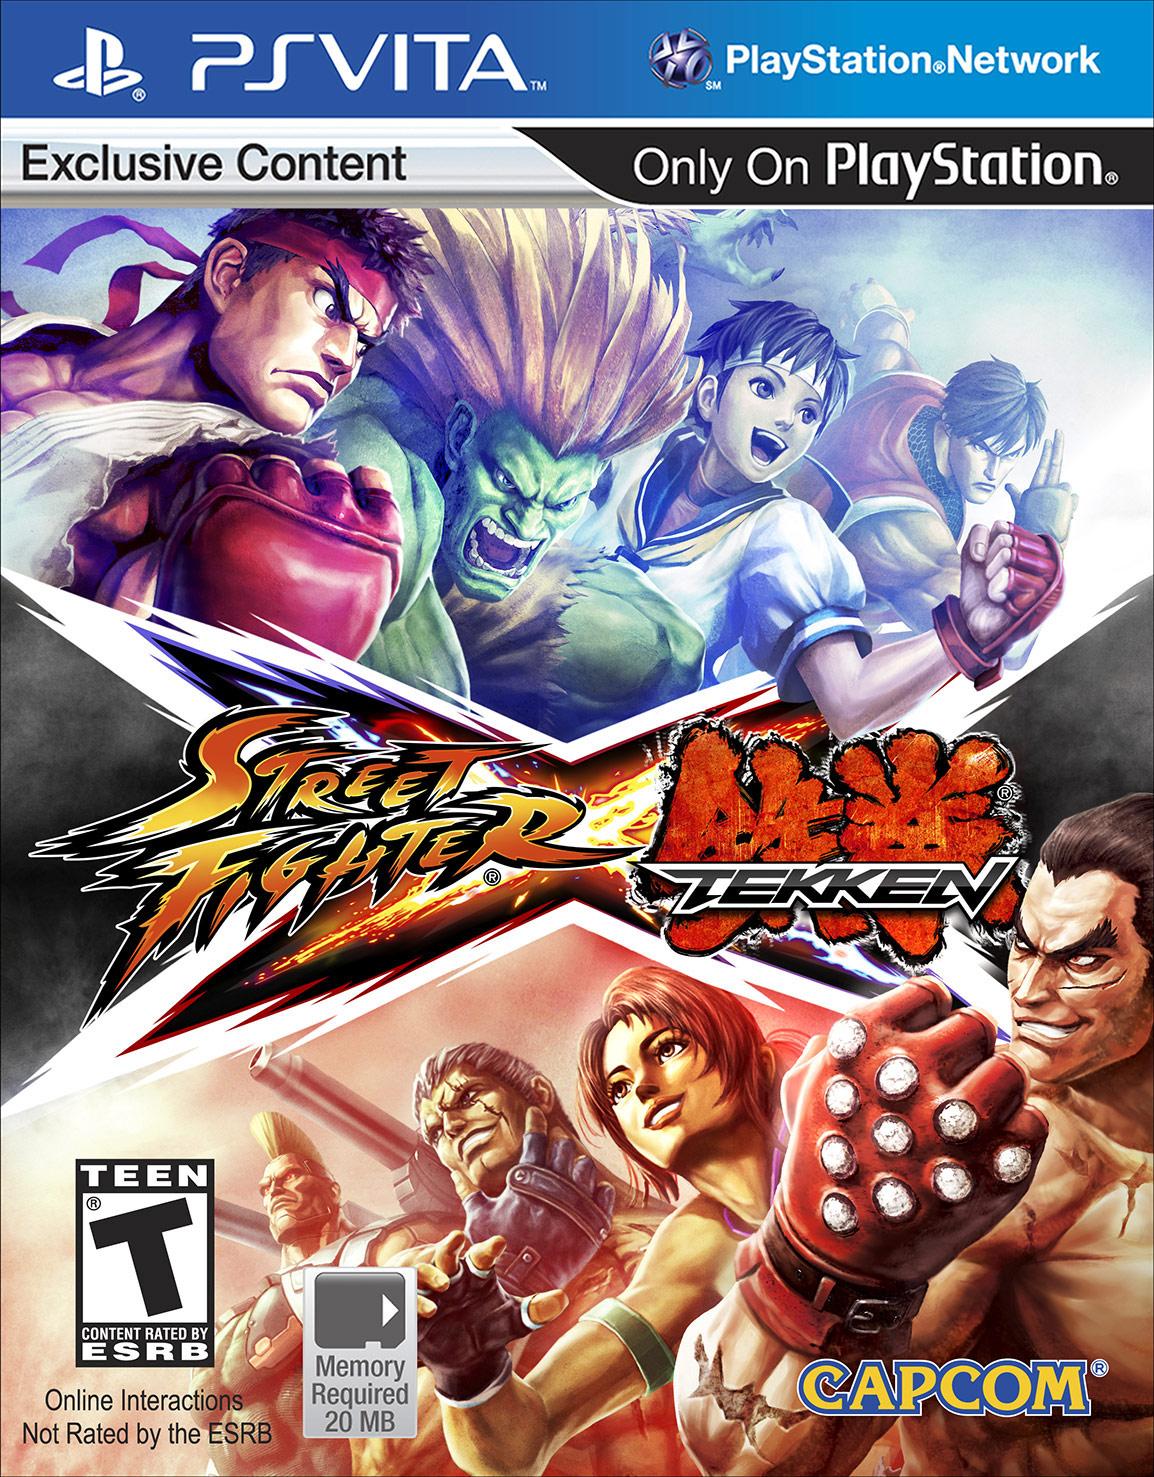 Fightvg Quick Pic Street Fighter X Tekken Ps Vita Box Art